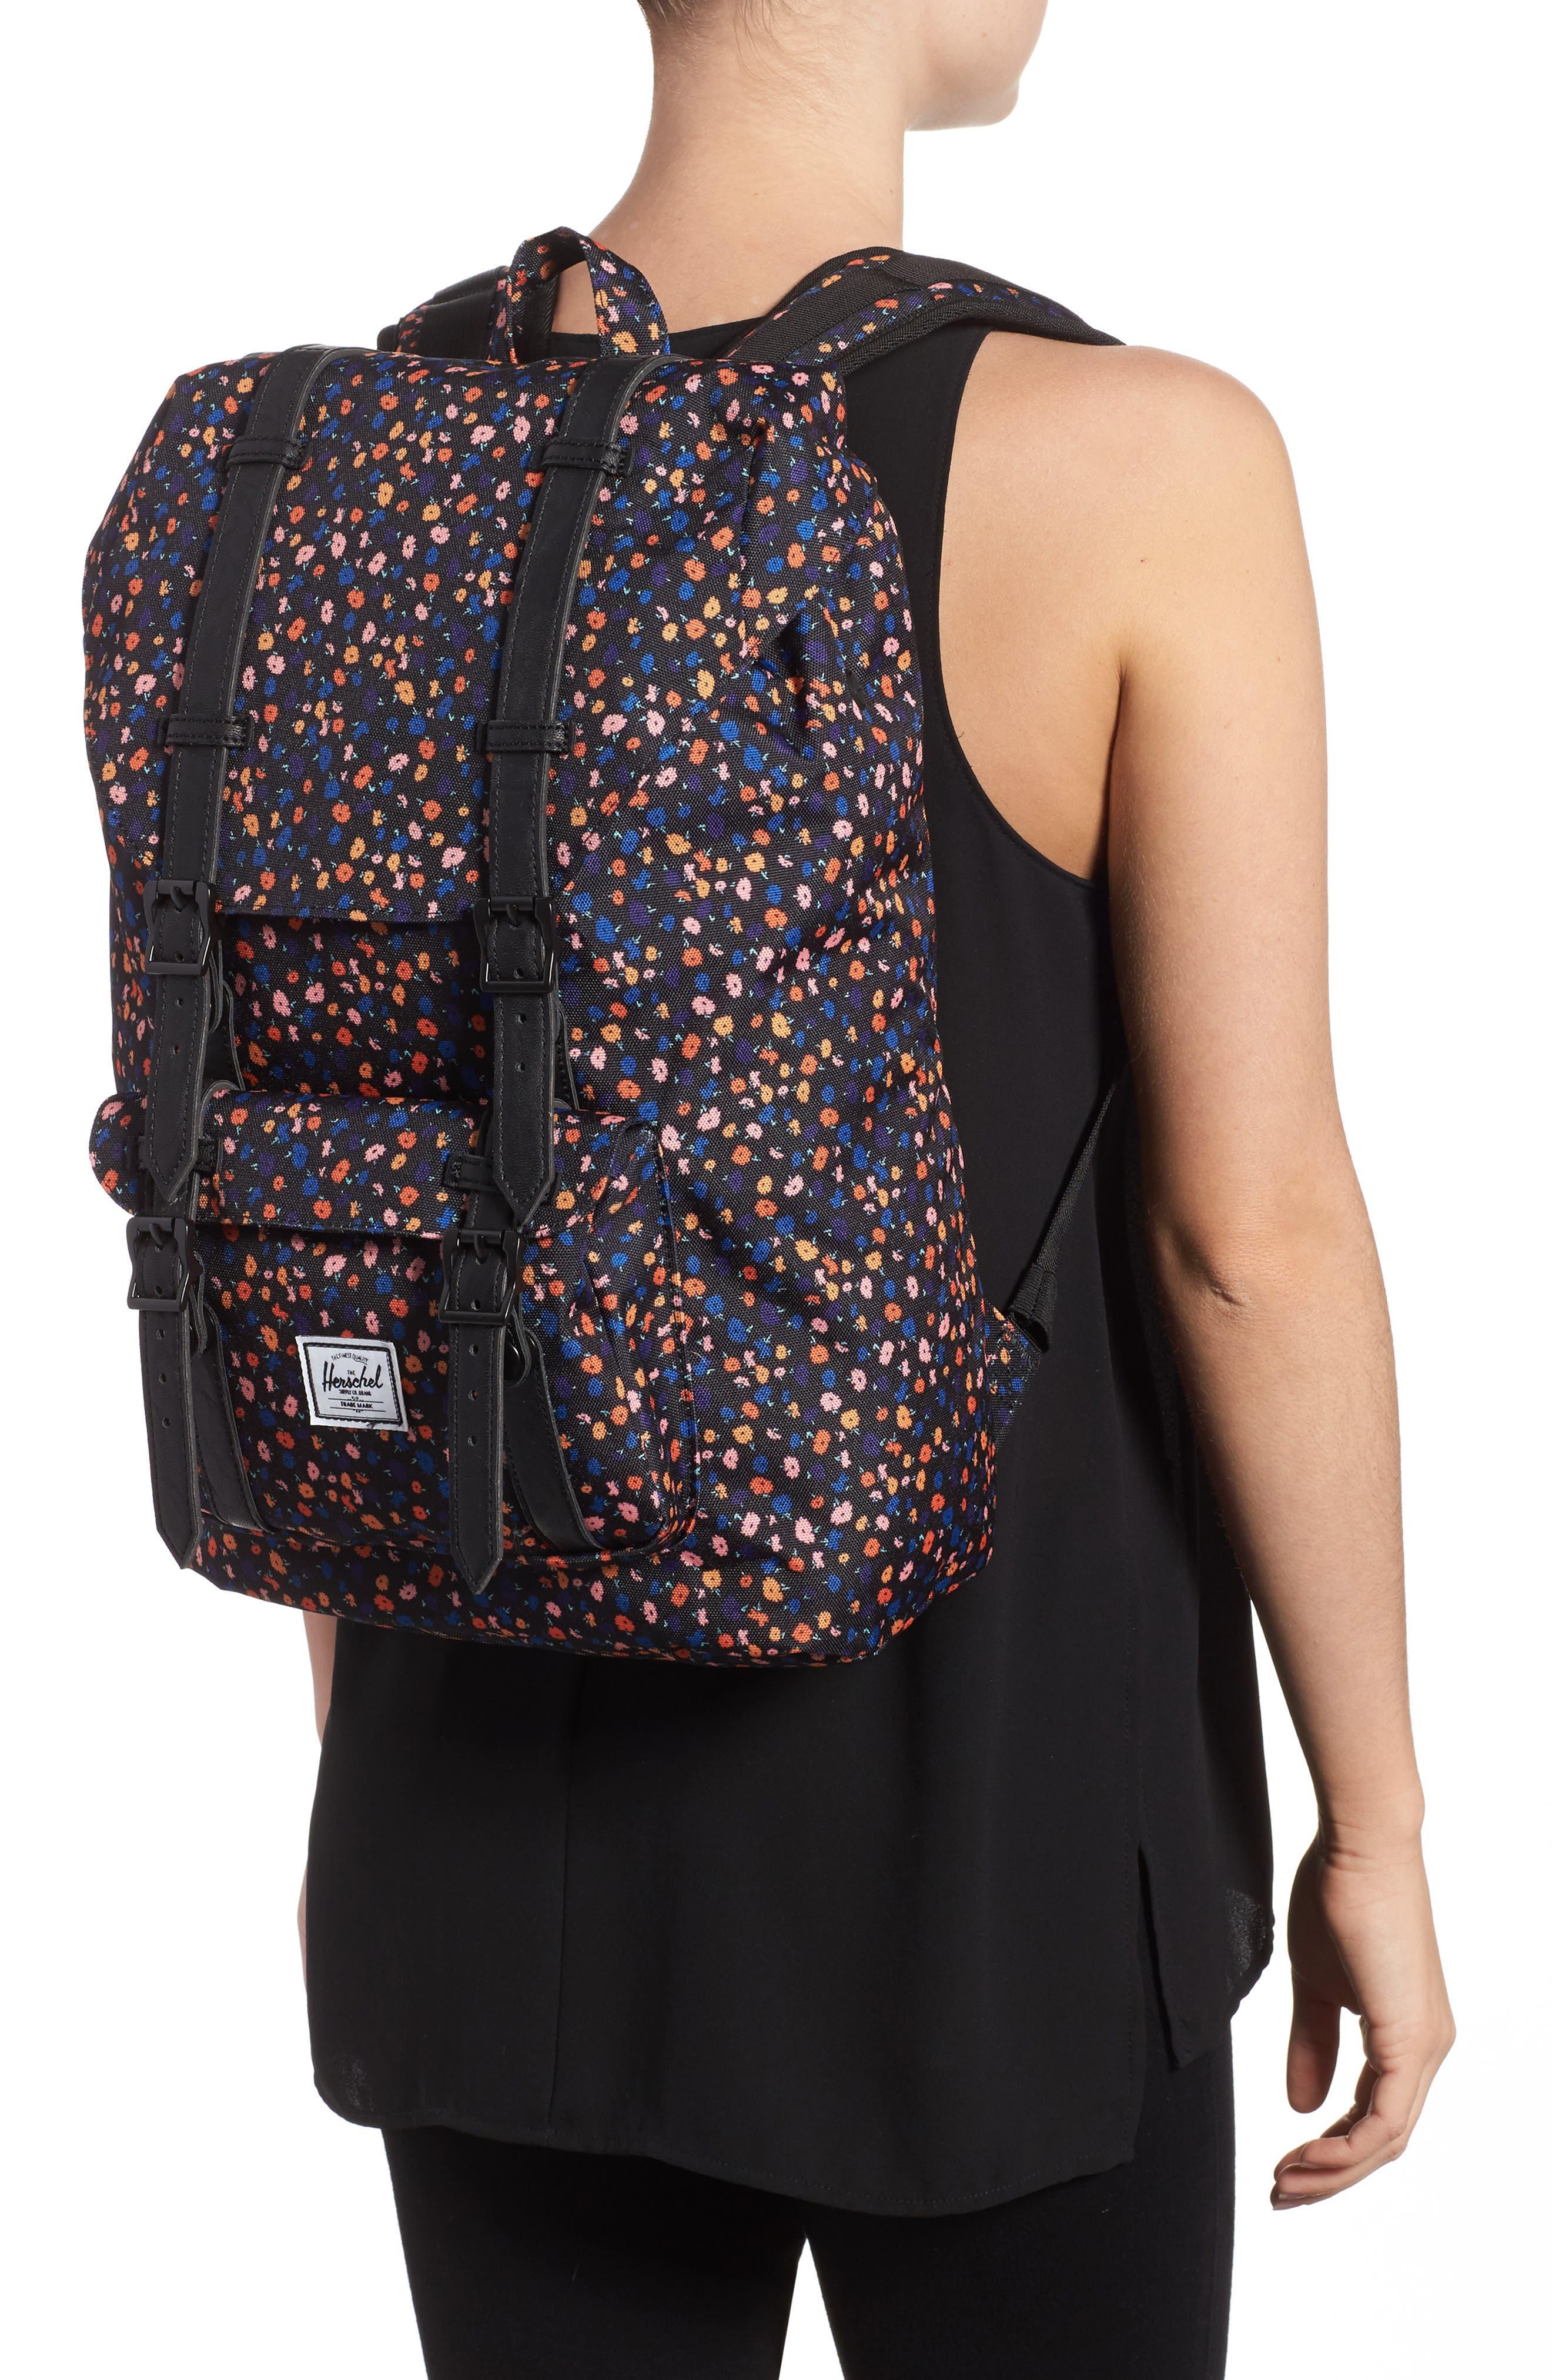 Little America - Mid Volume Backpack,                             Alternate thumbnail 2, color,                             Black Mini Floral